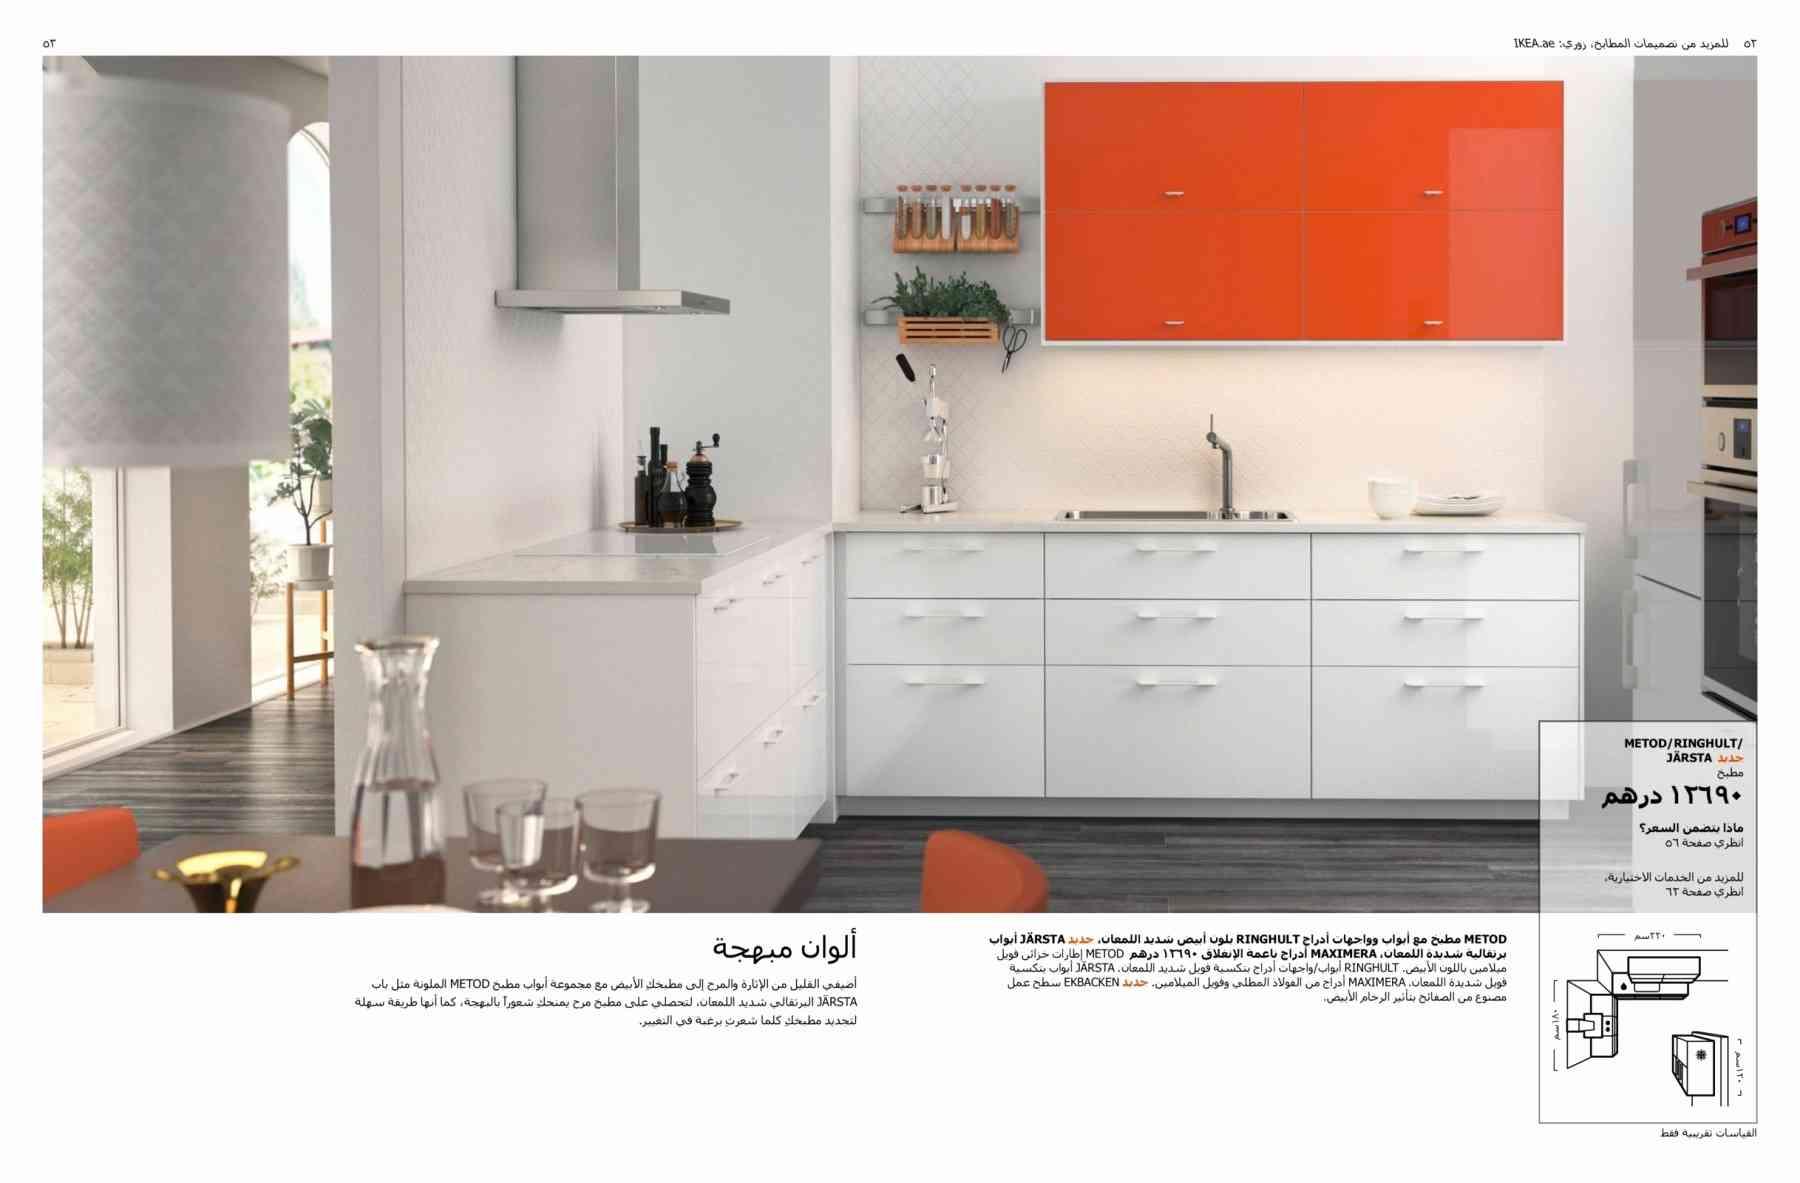 Ikea Cuisine Laxarby Inspirant Photos 24 Awesome Stock Prix Cuisine Ikea Avec Ilot Central De 2018